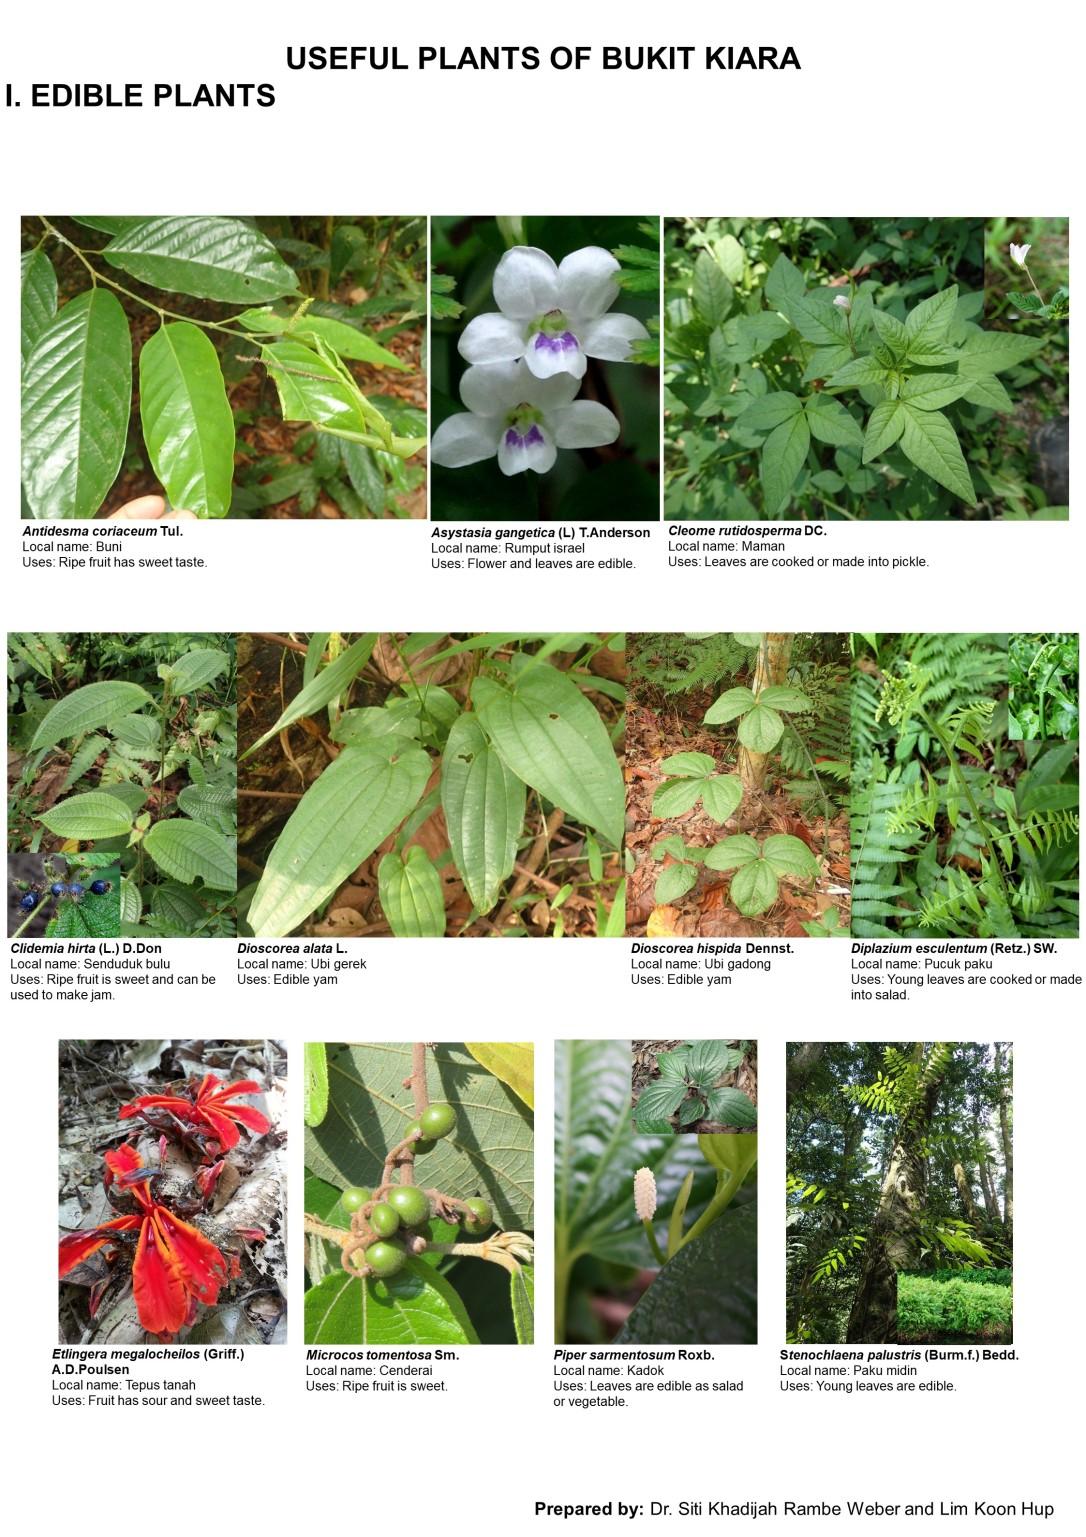 Edible-Useful plants of Bukit Kiara